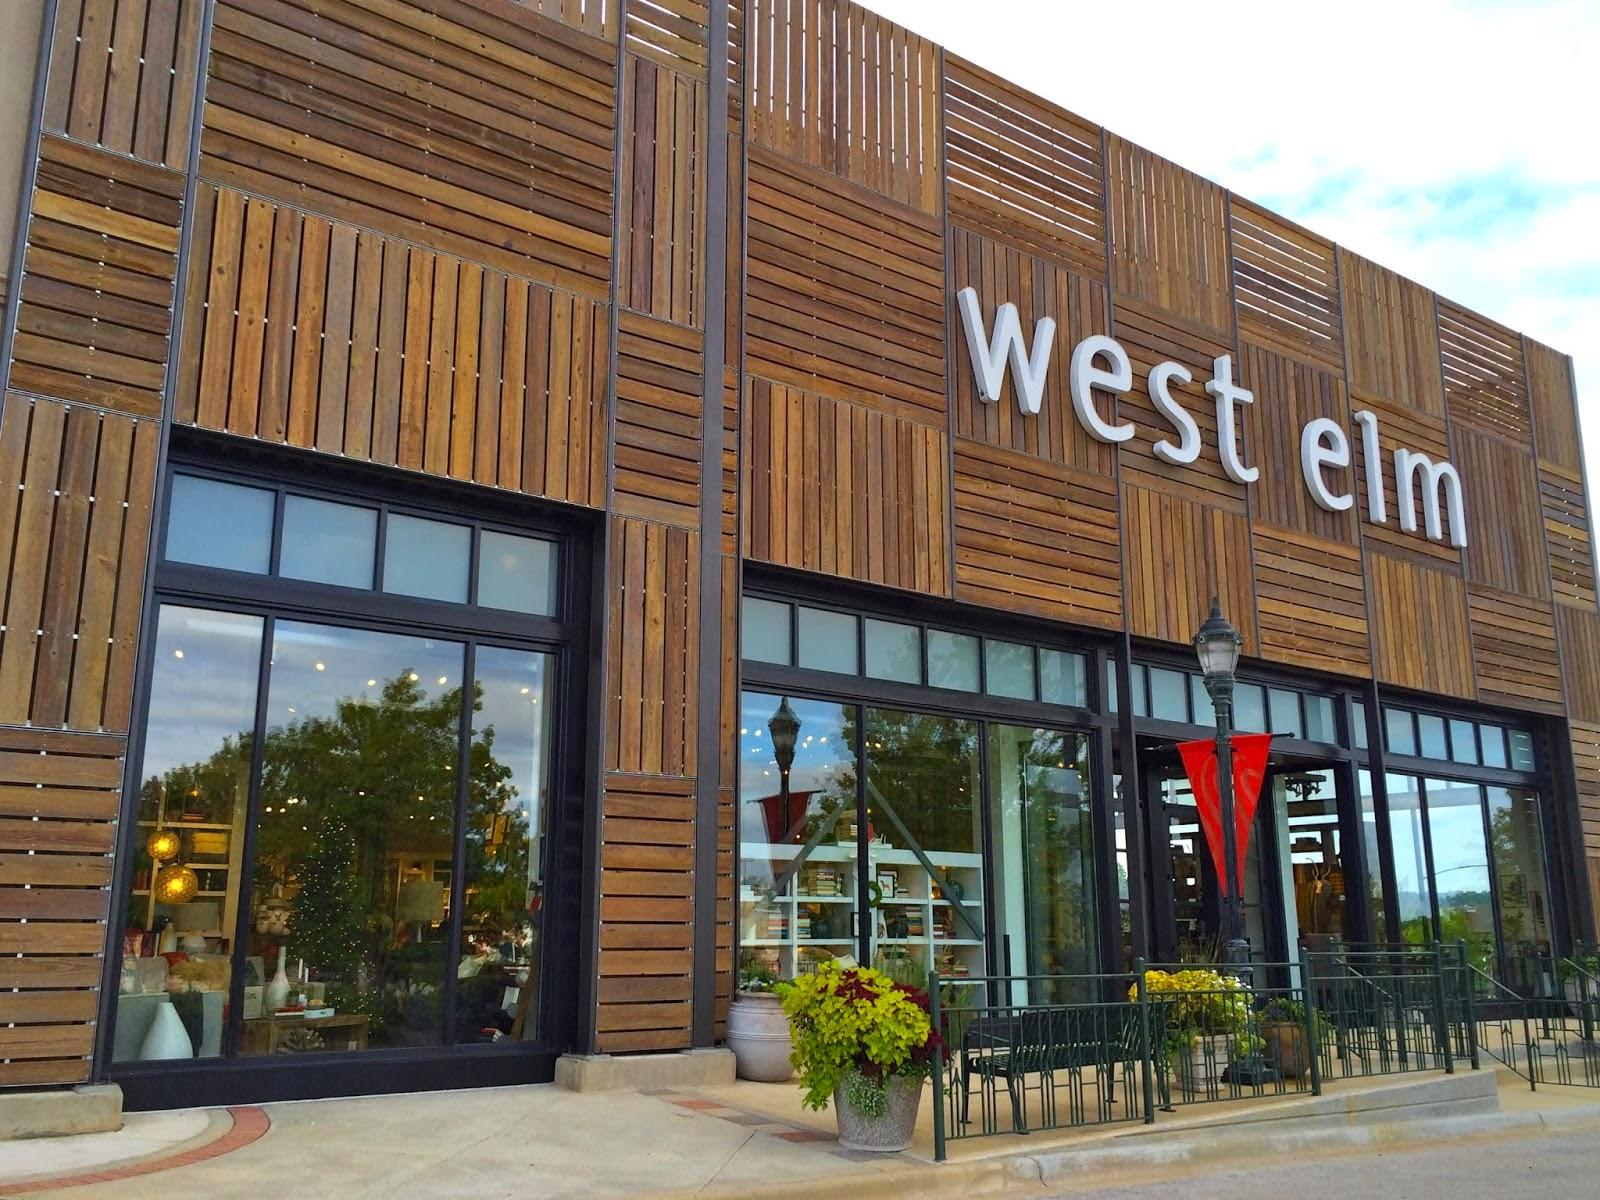 West Elm Opens Store in Bellevue - The Registry